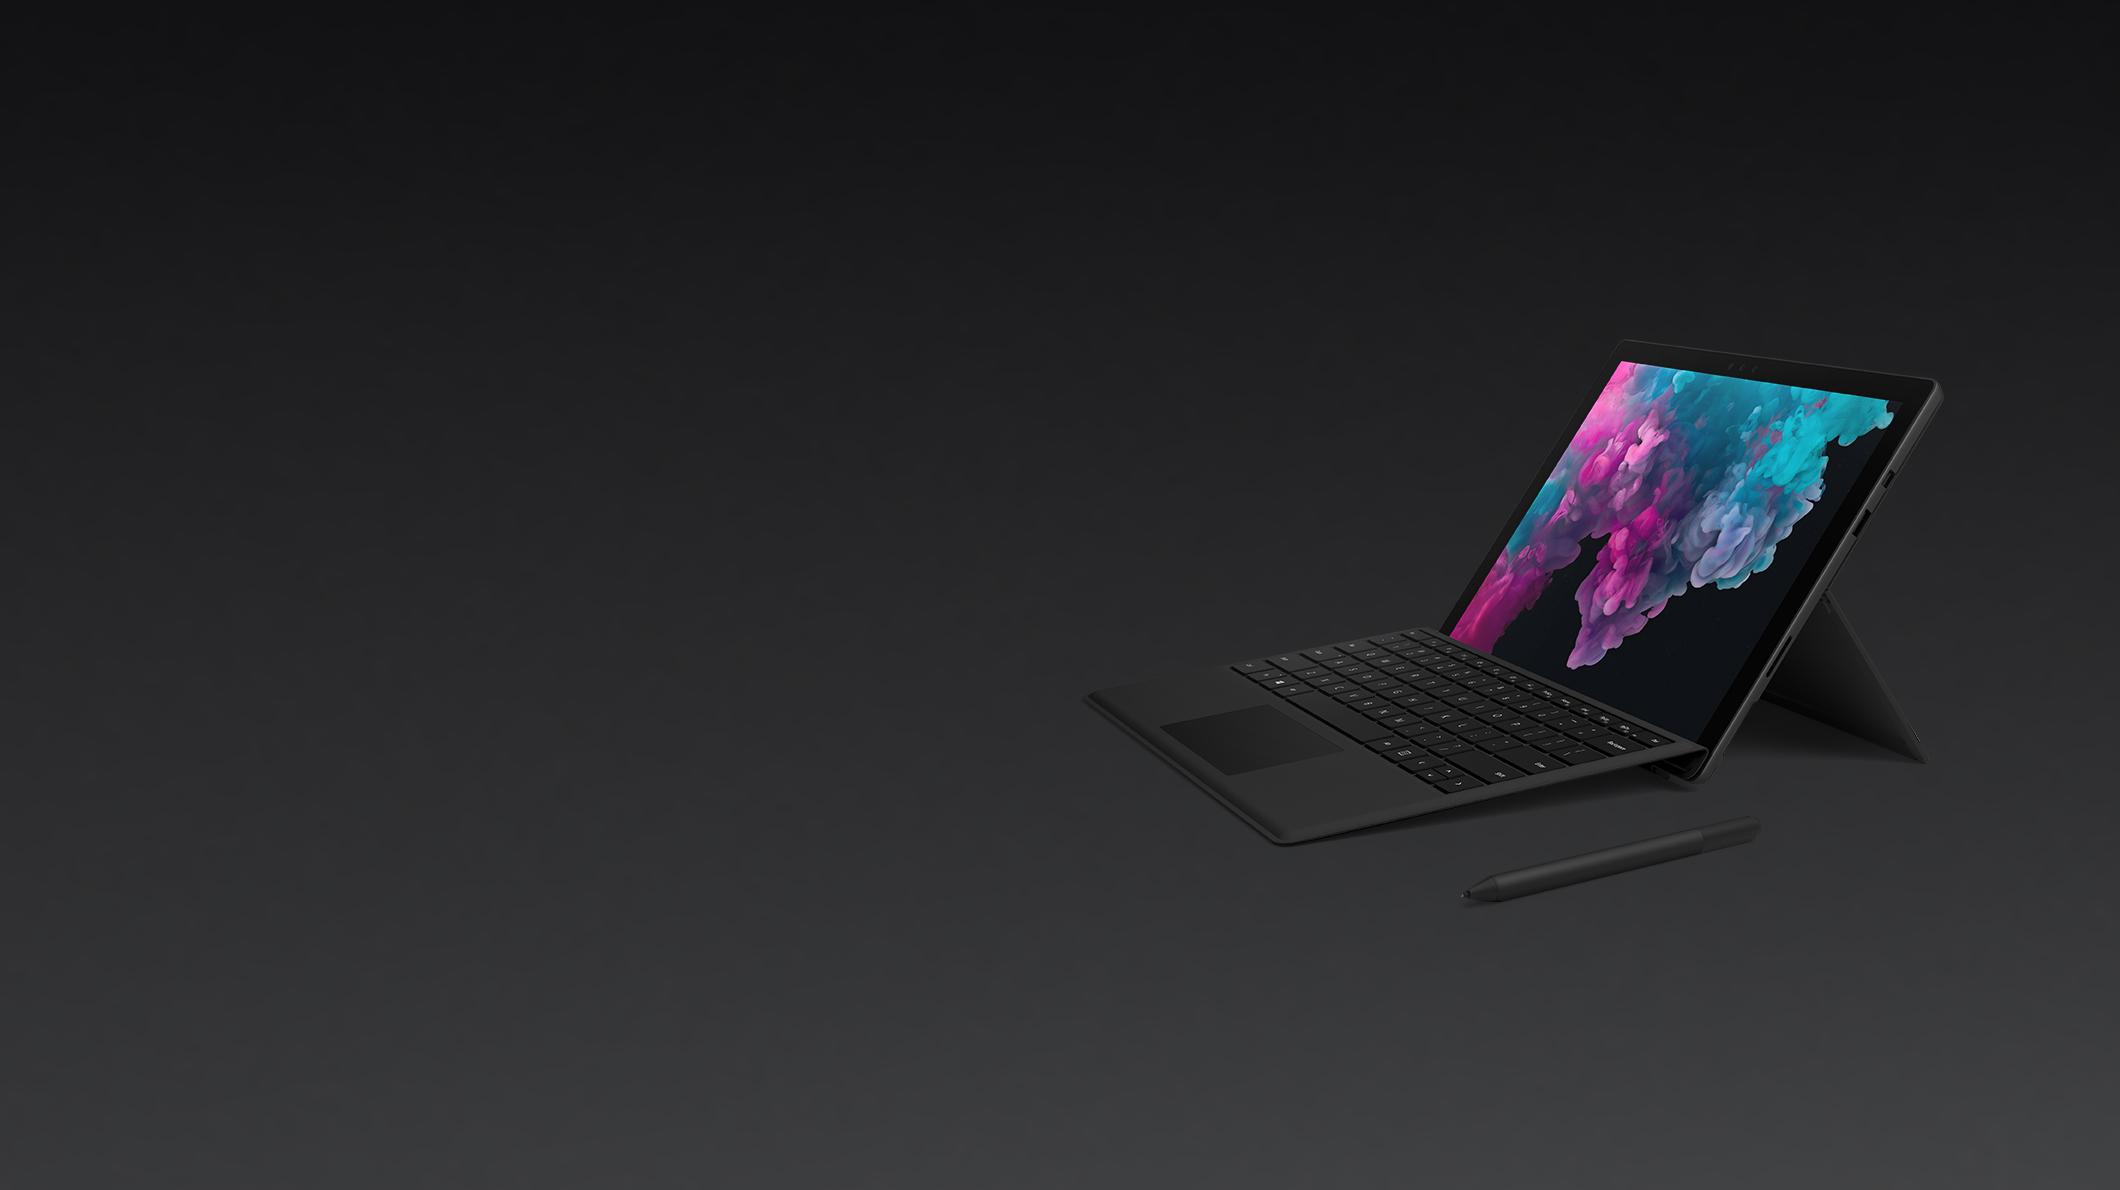 Surface Pro 6, Surface Pro Type cover (Black), Surface Pen (Black)